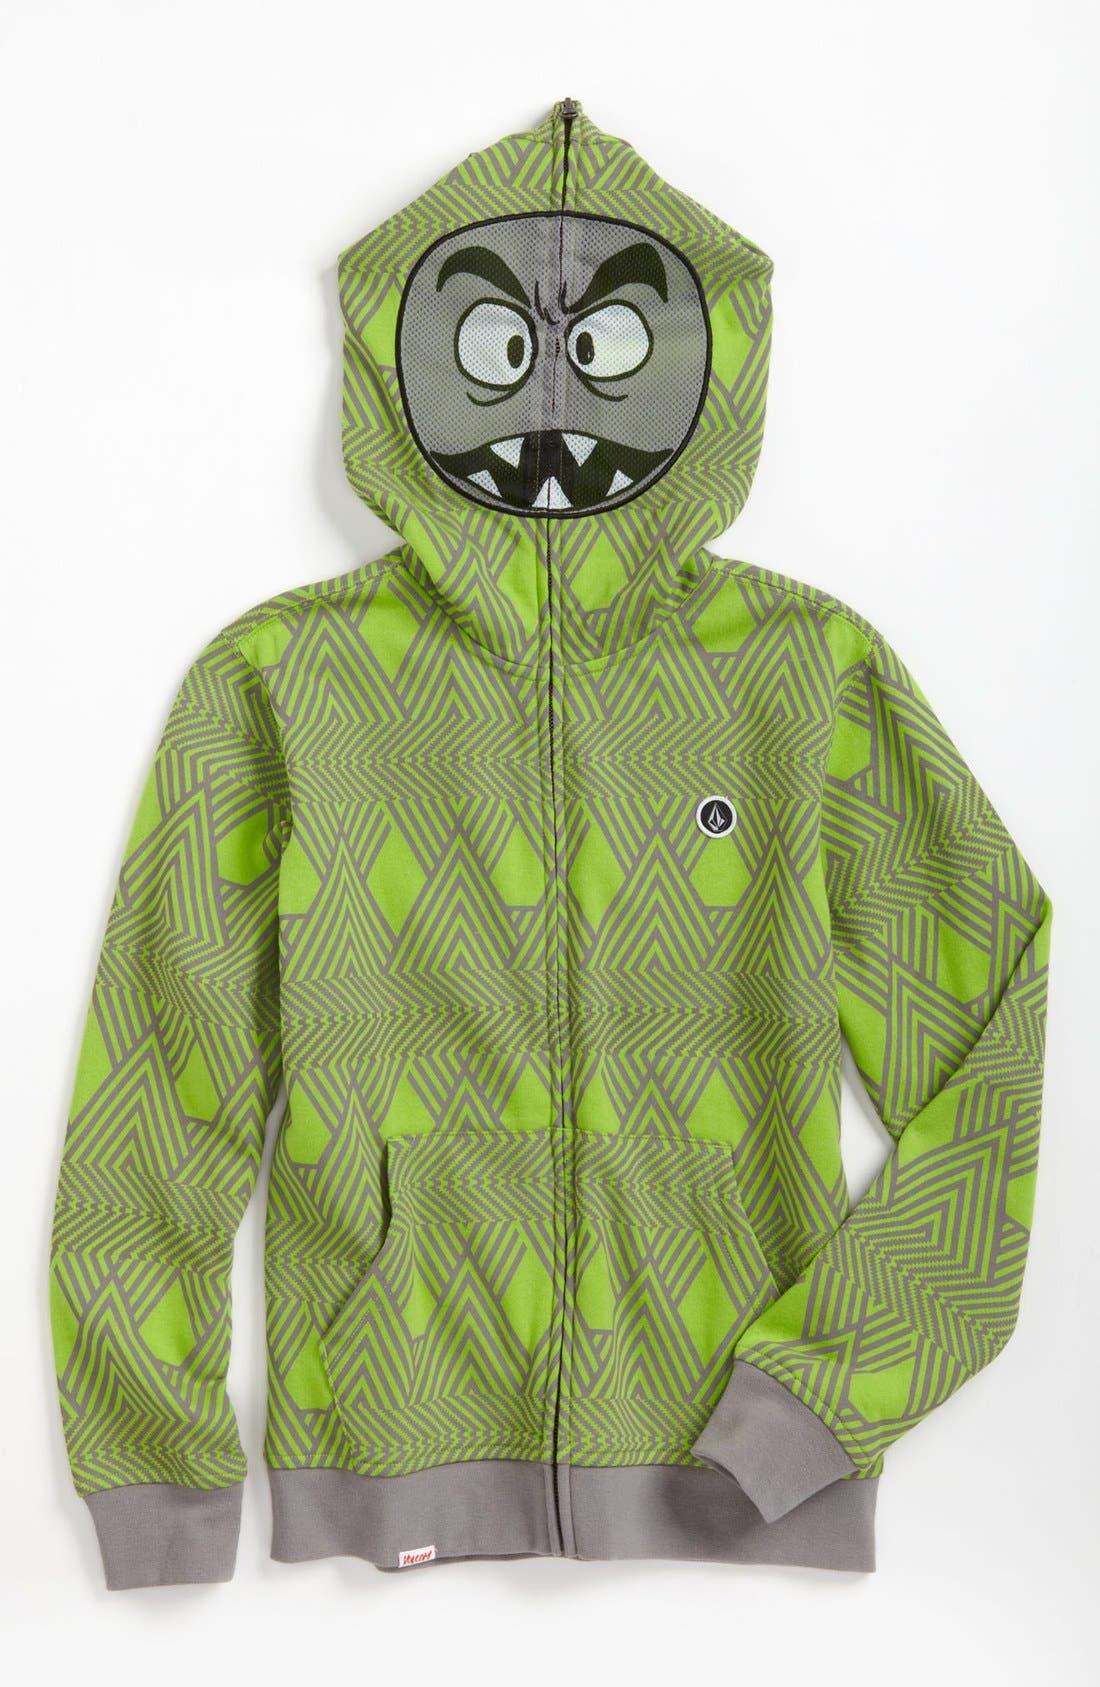 Alternate Image 1 Selected - Volcom 'Strange' Mask Hoodie (Big Boys)